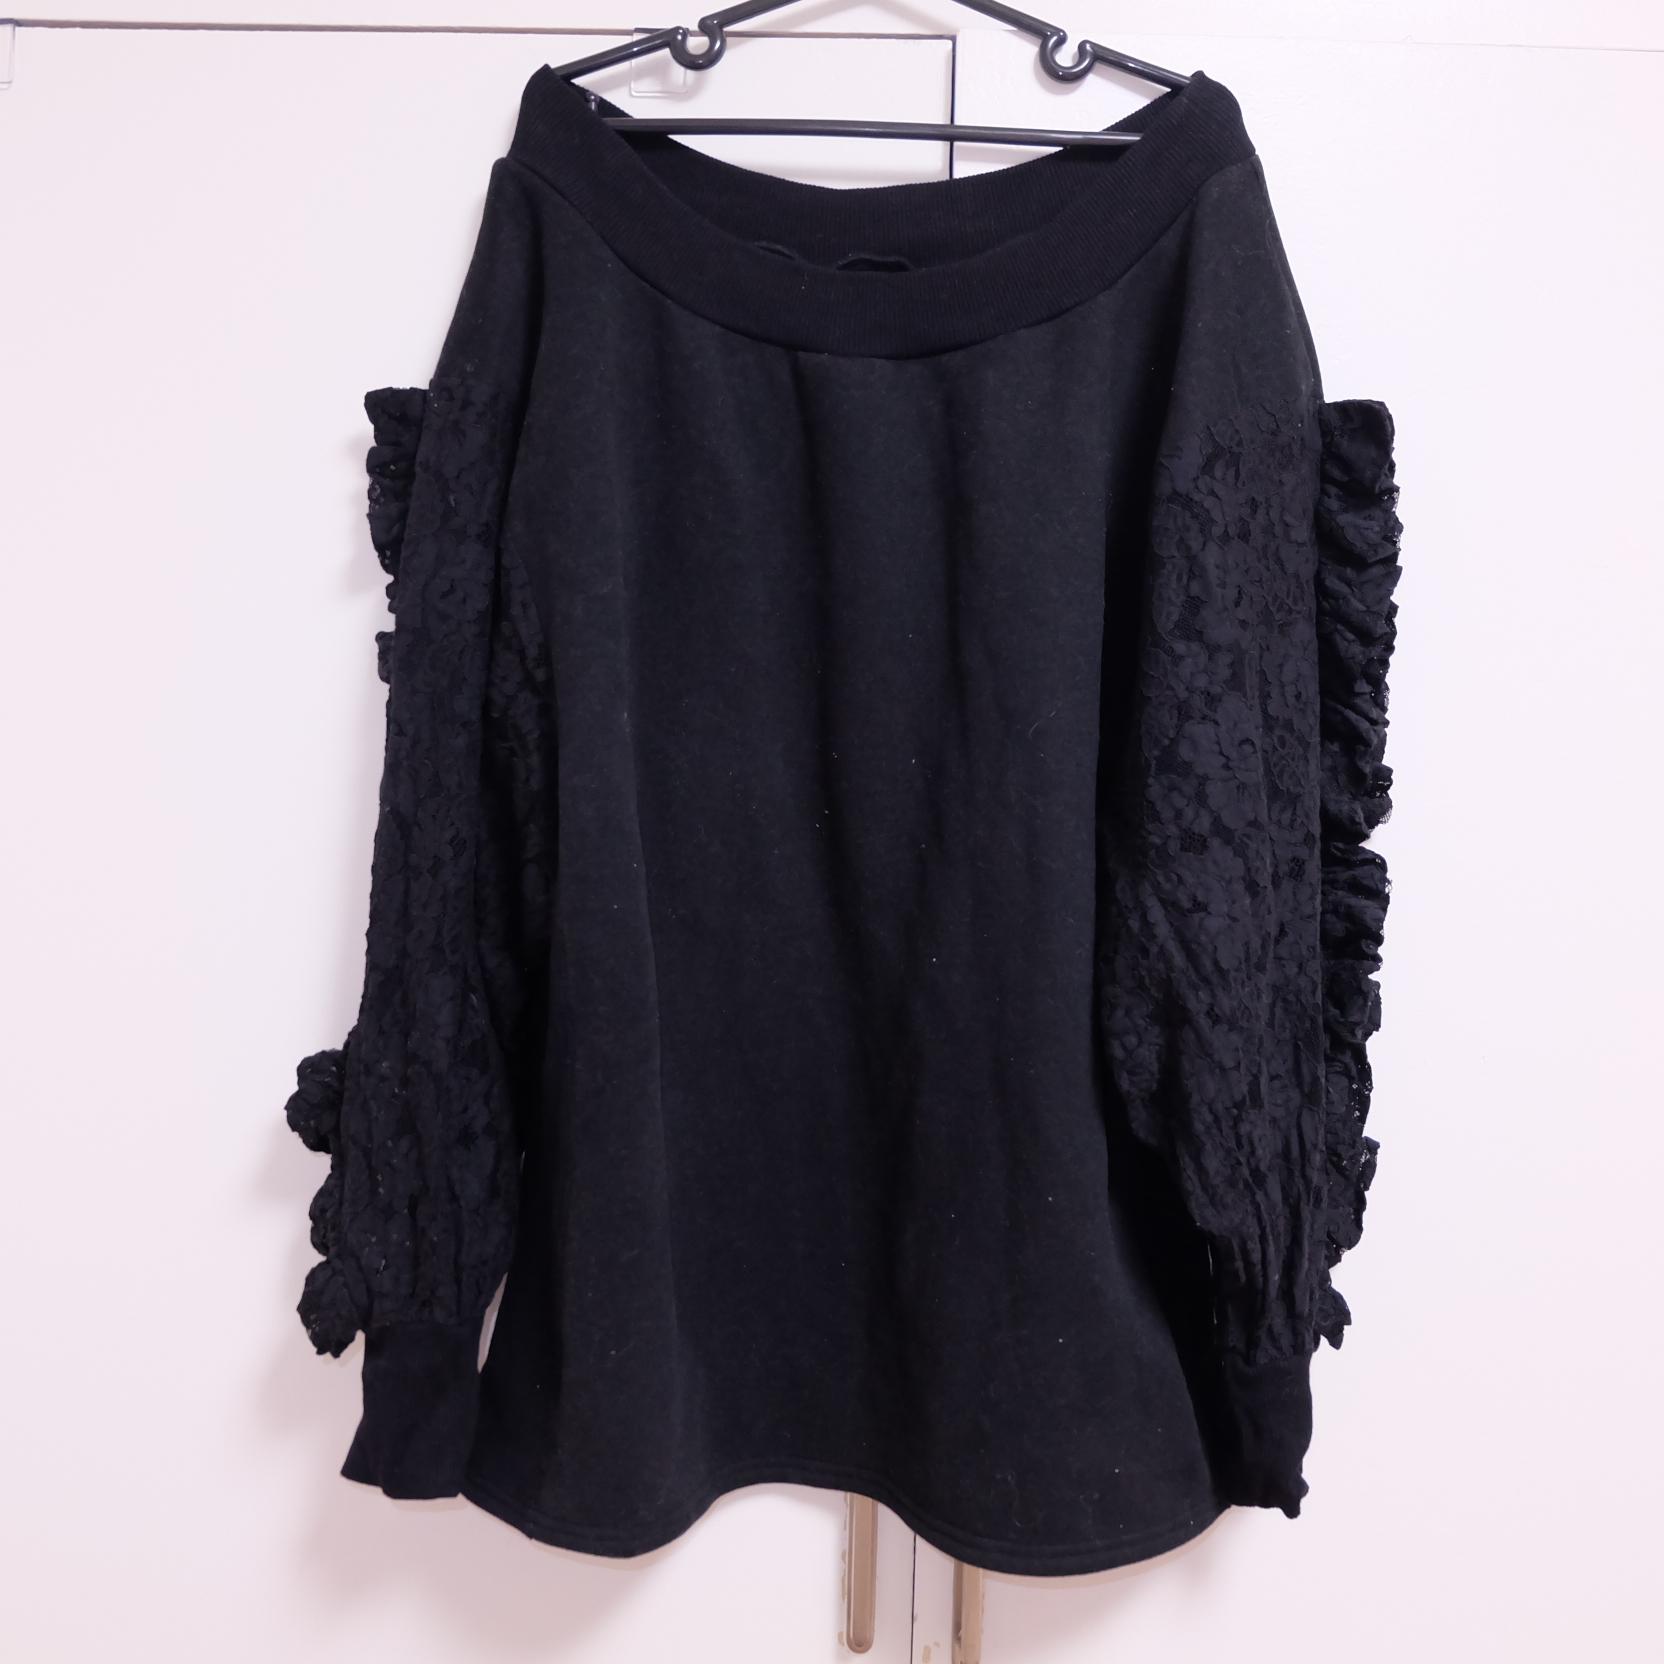 1362af9ecc7 Gothic Shoulderless Lace Sweater  38.00